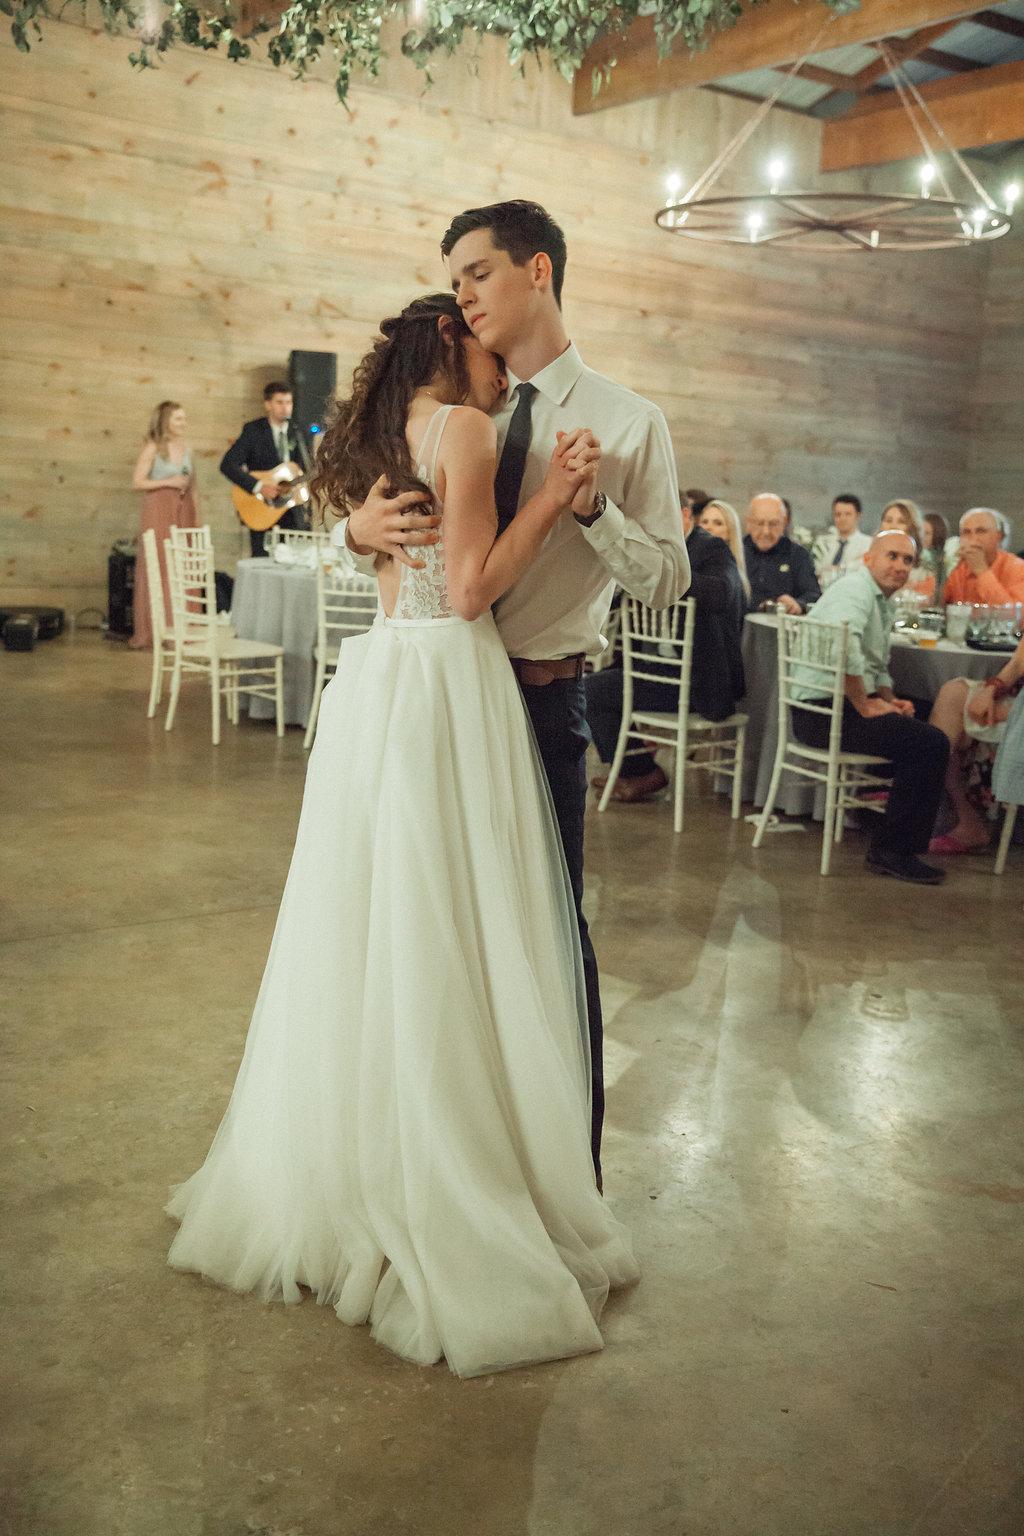 Honeysuckle-Hill-Weddings-Mallory-Patrick-118.jpg